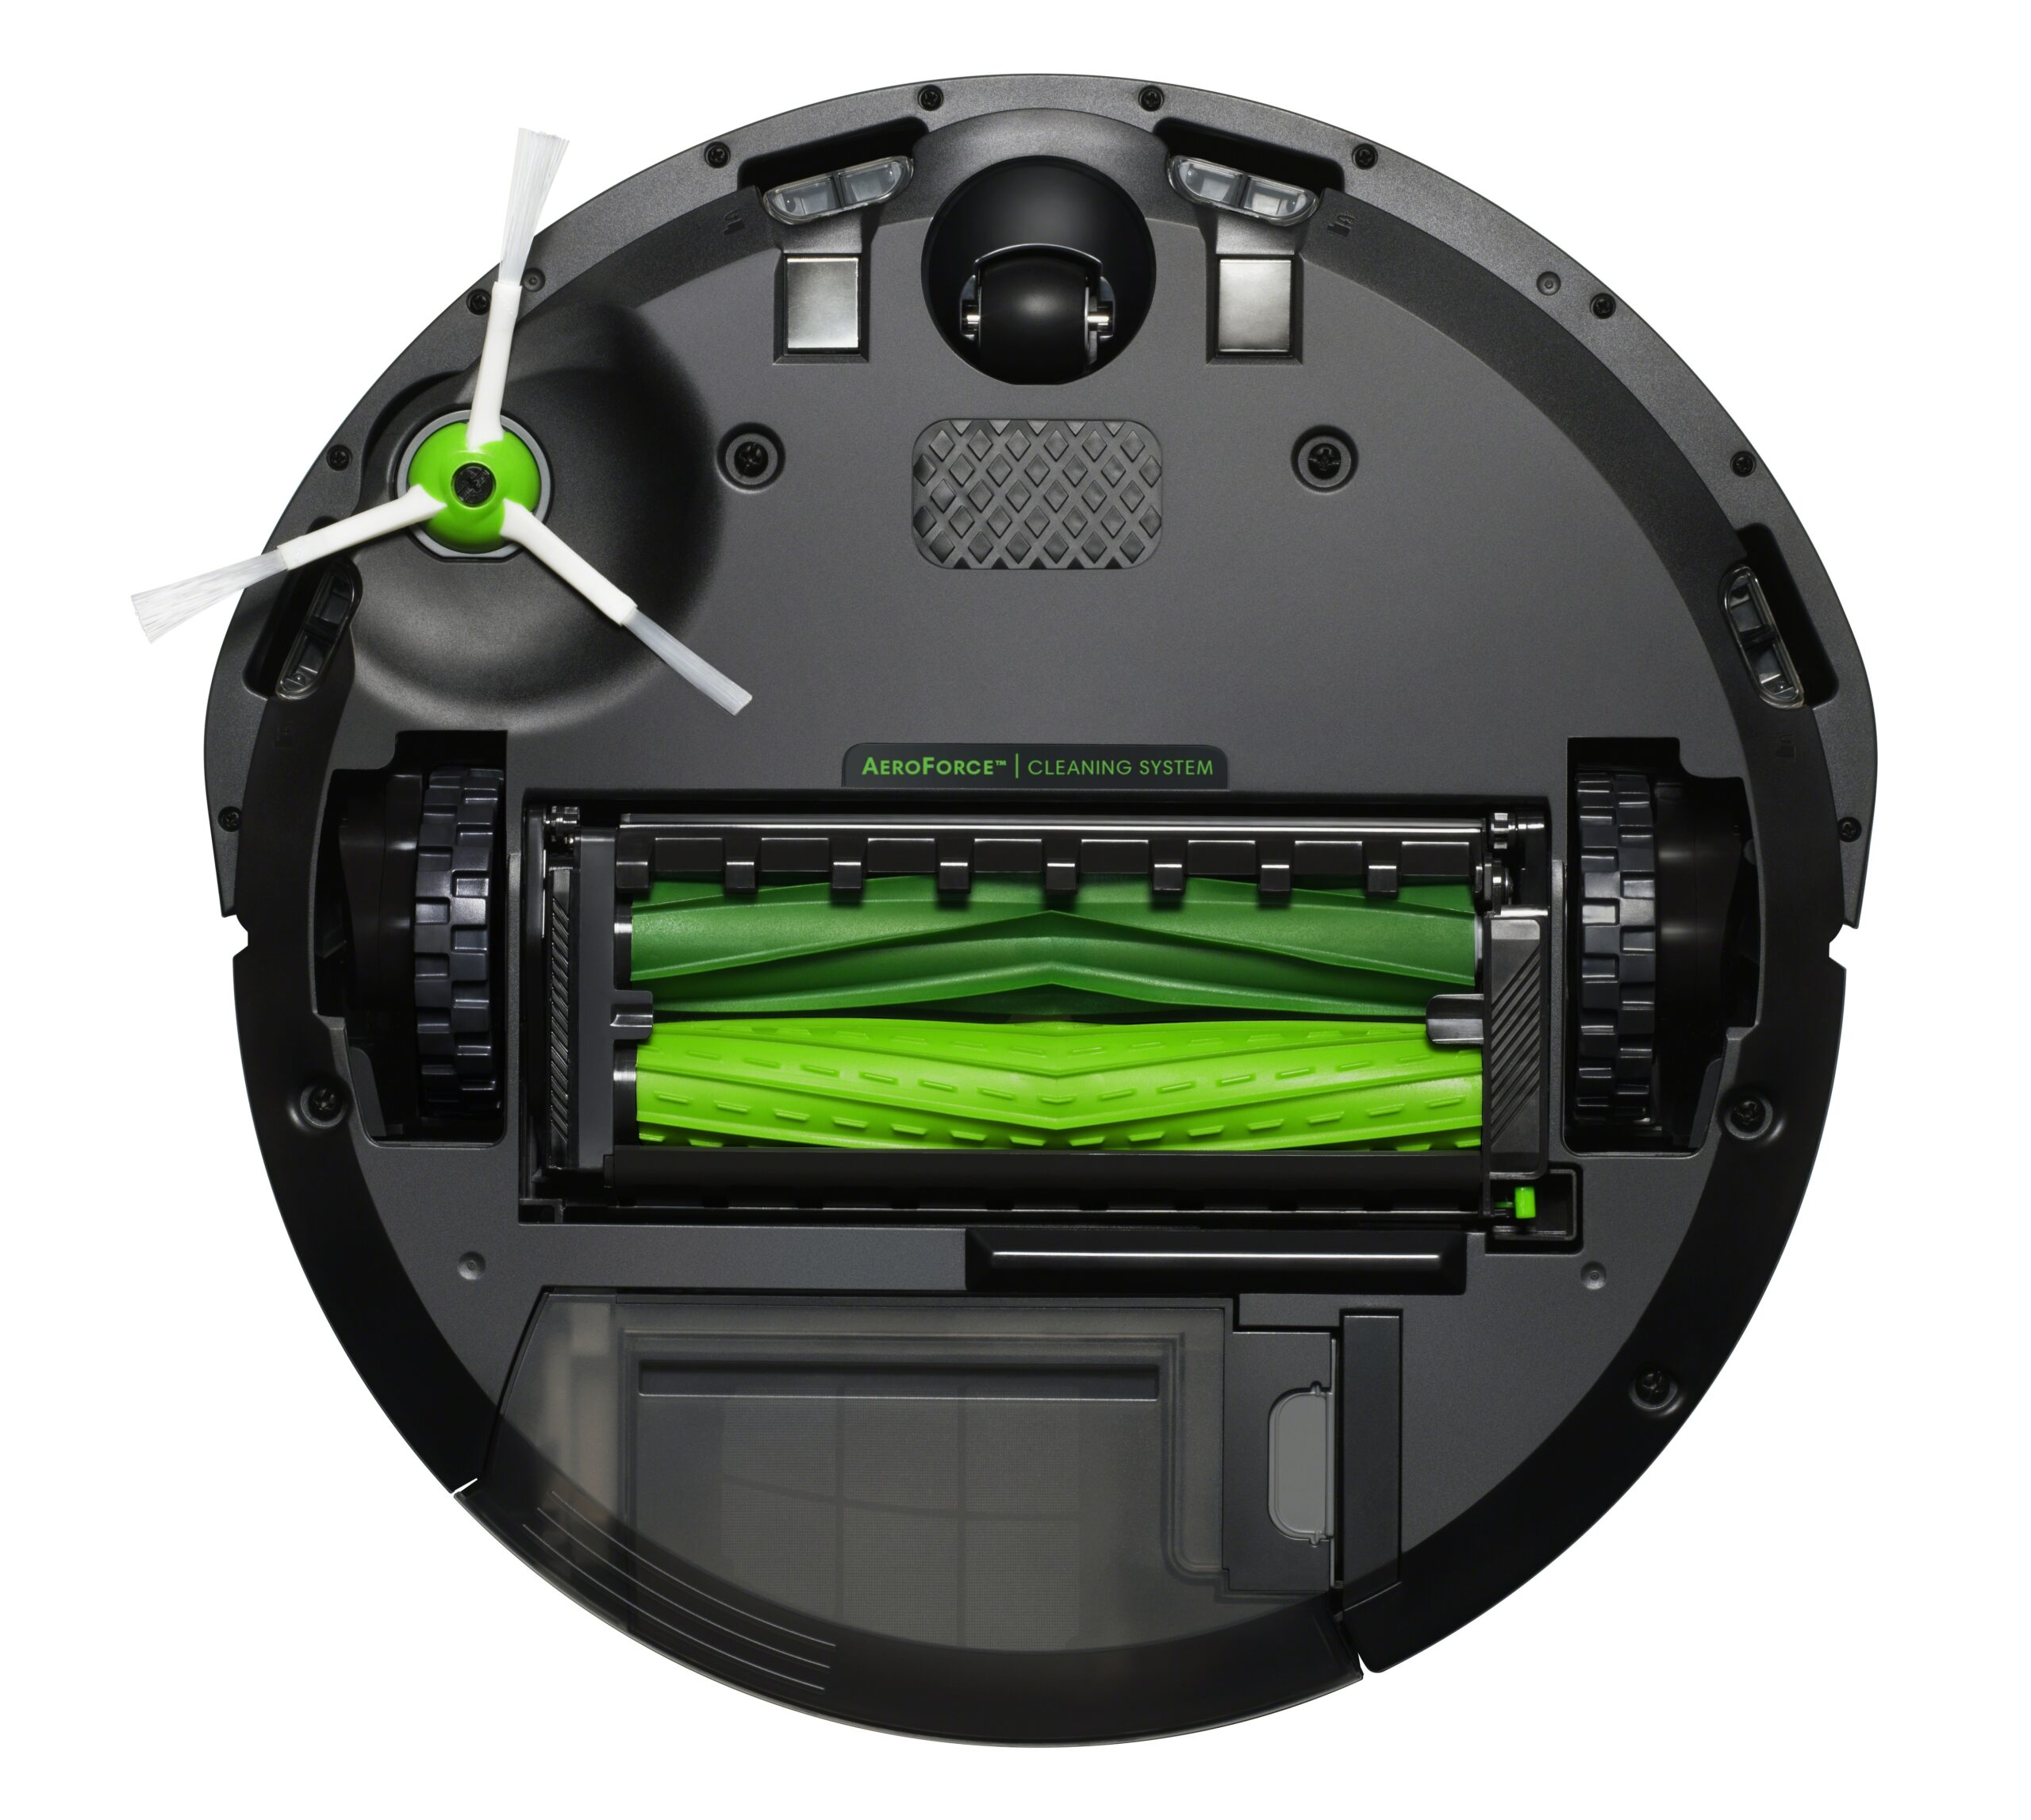 Roomba underside